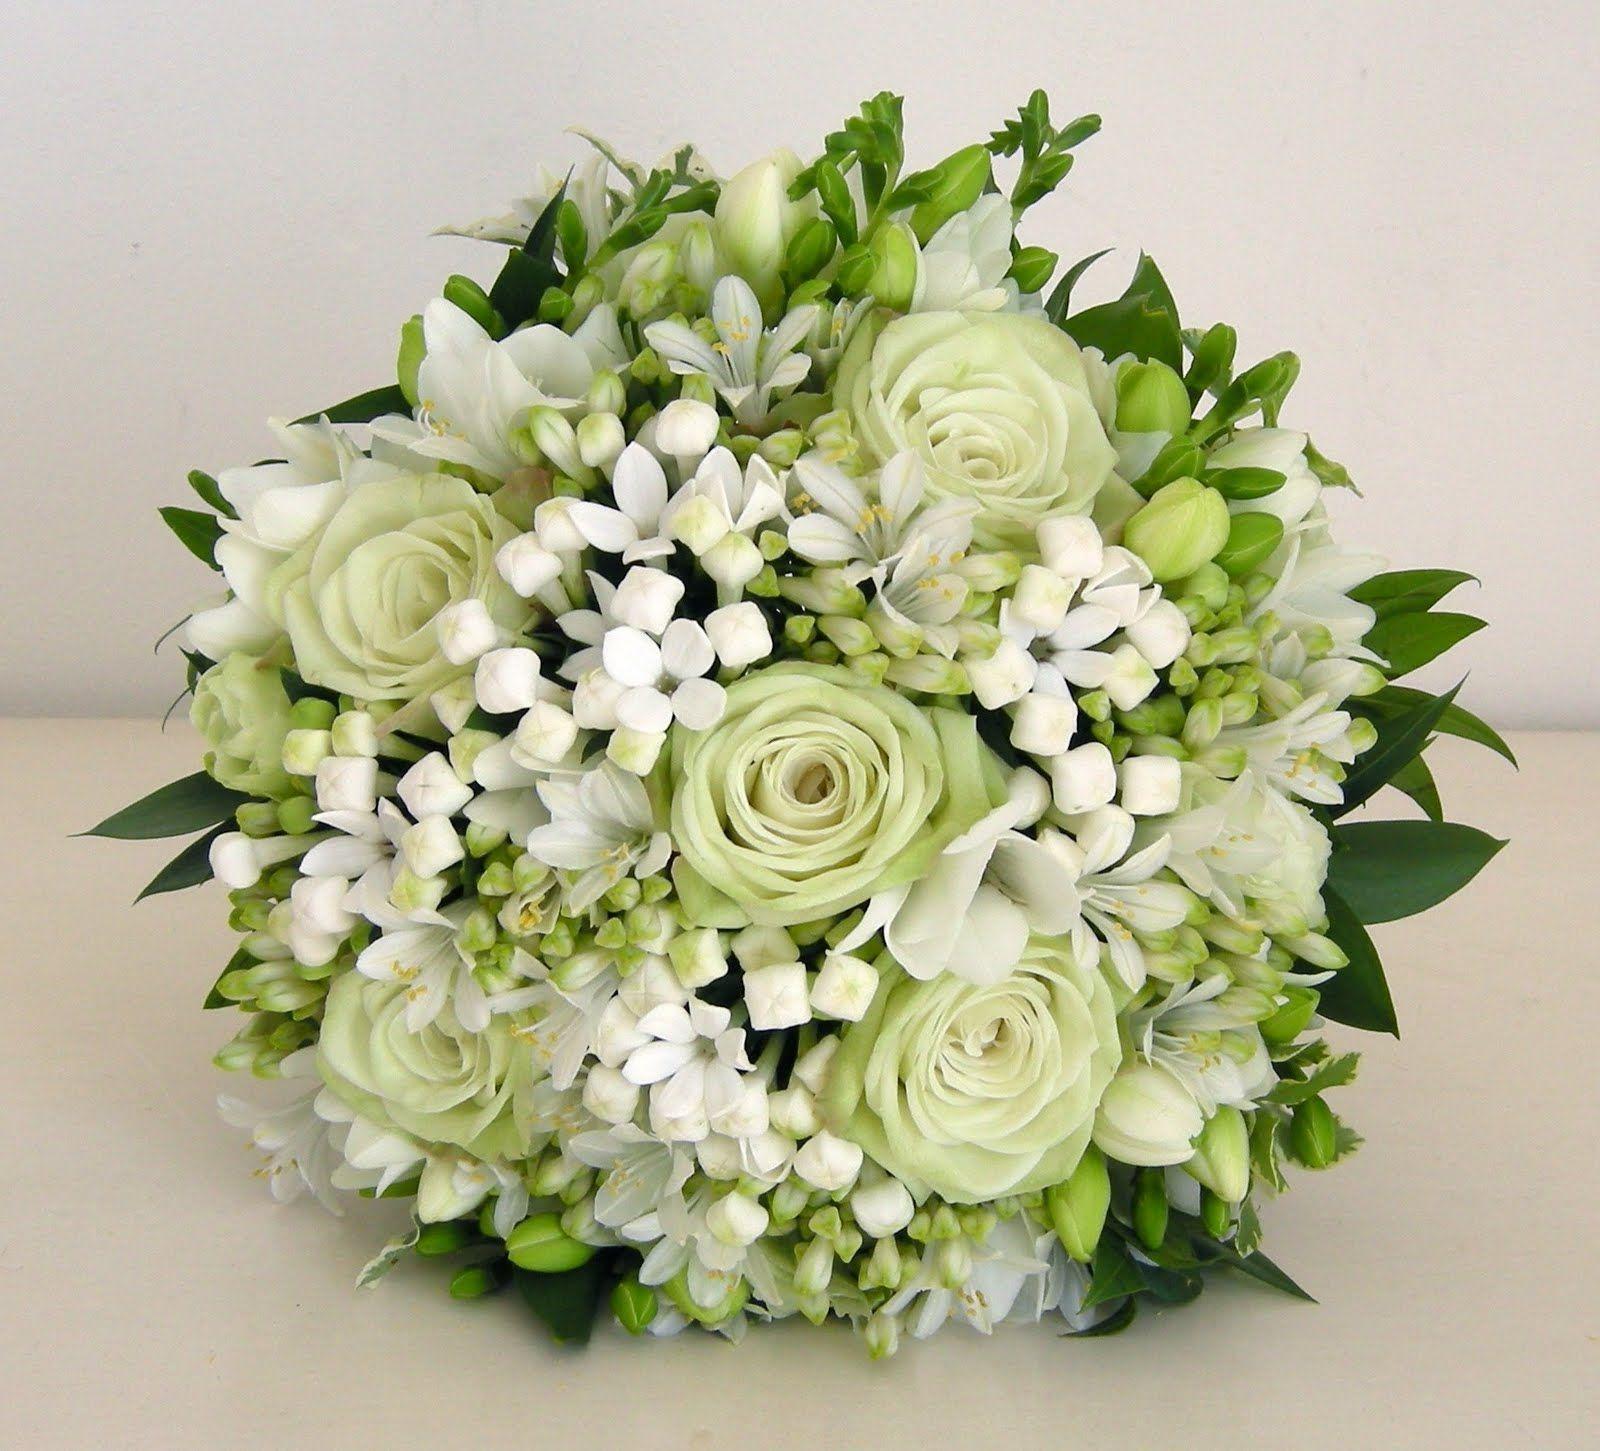 Bouquet Sposa Fiori D Arancio.Fiori D Arancio Bouquet Sposa Cerca Con Google Bouquet